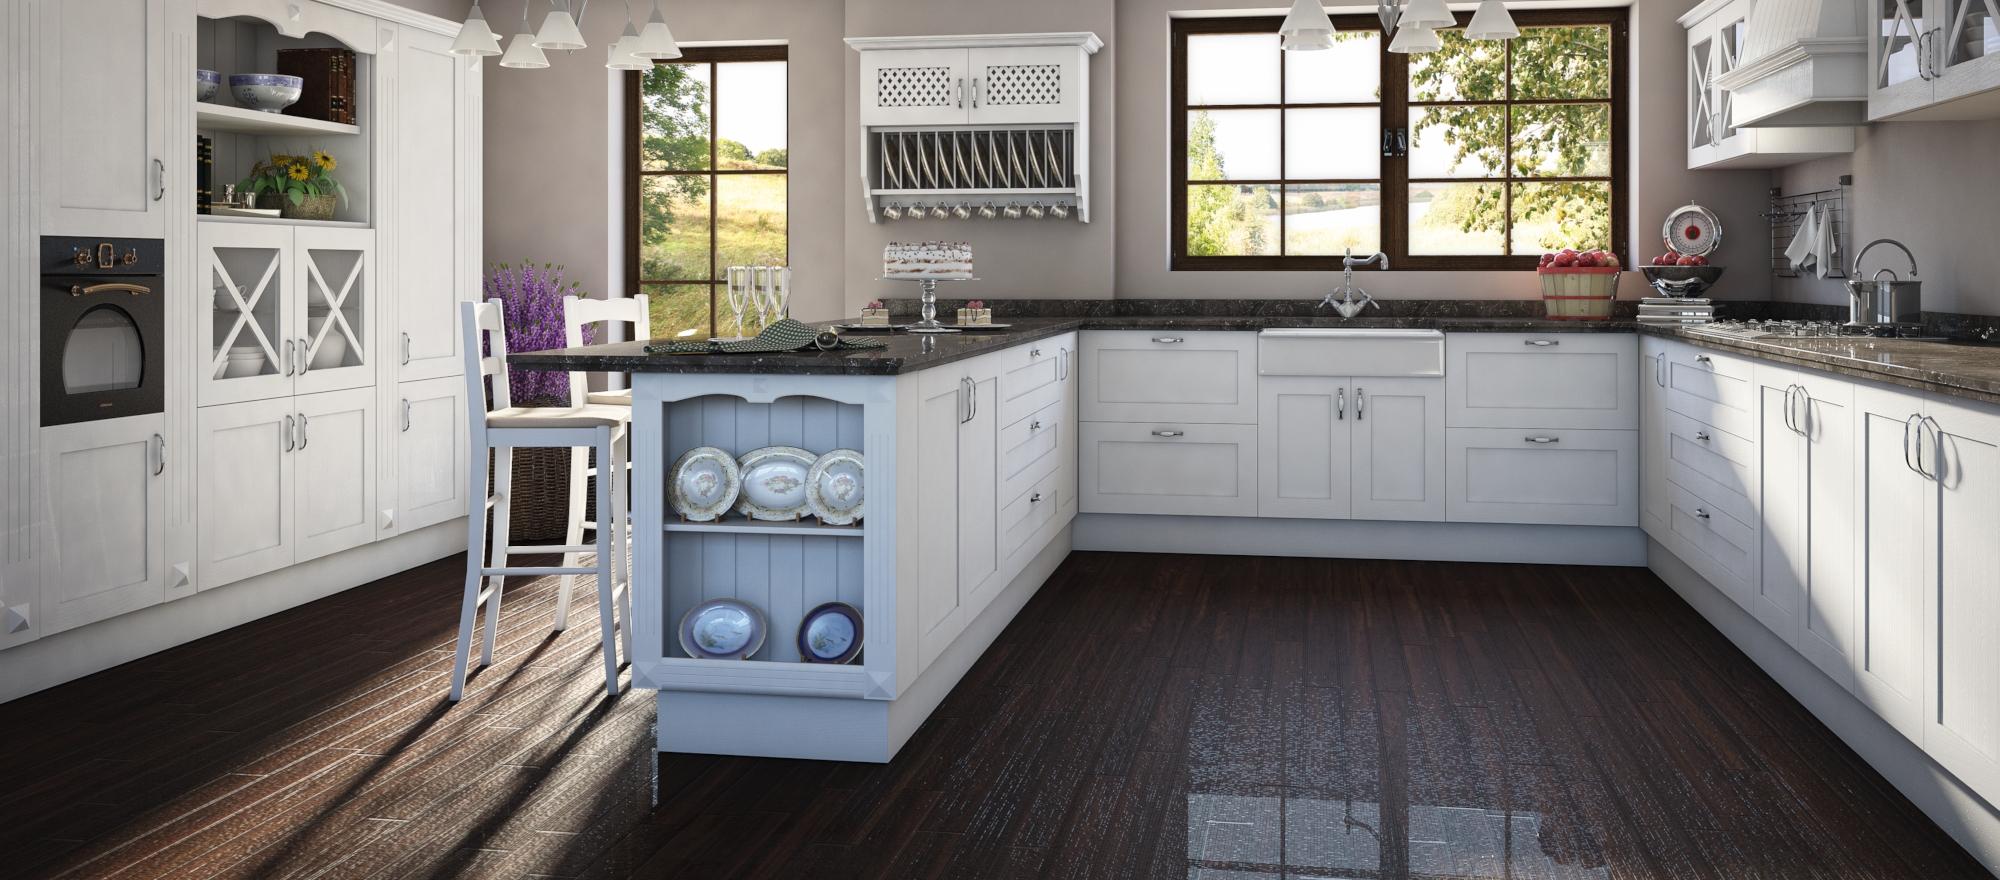 Urpime – Fabricante de muebles de cocina